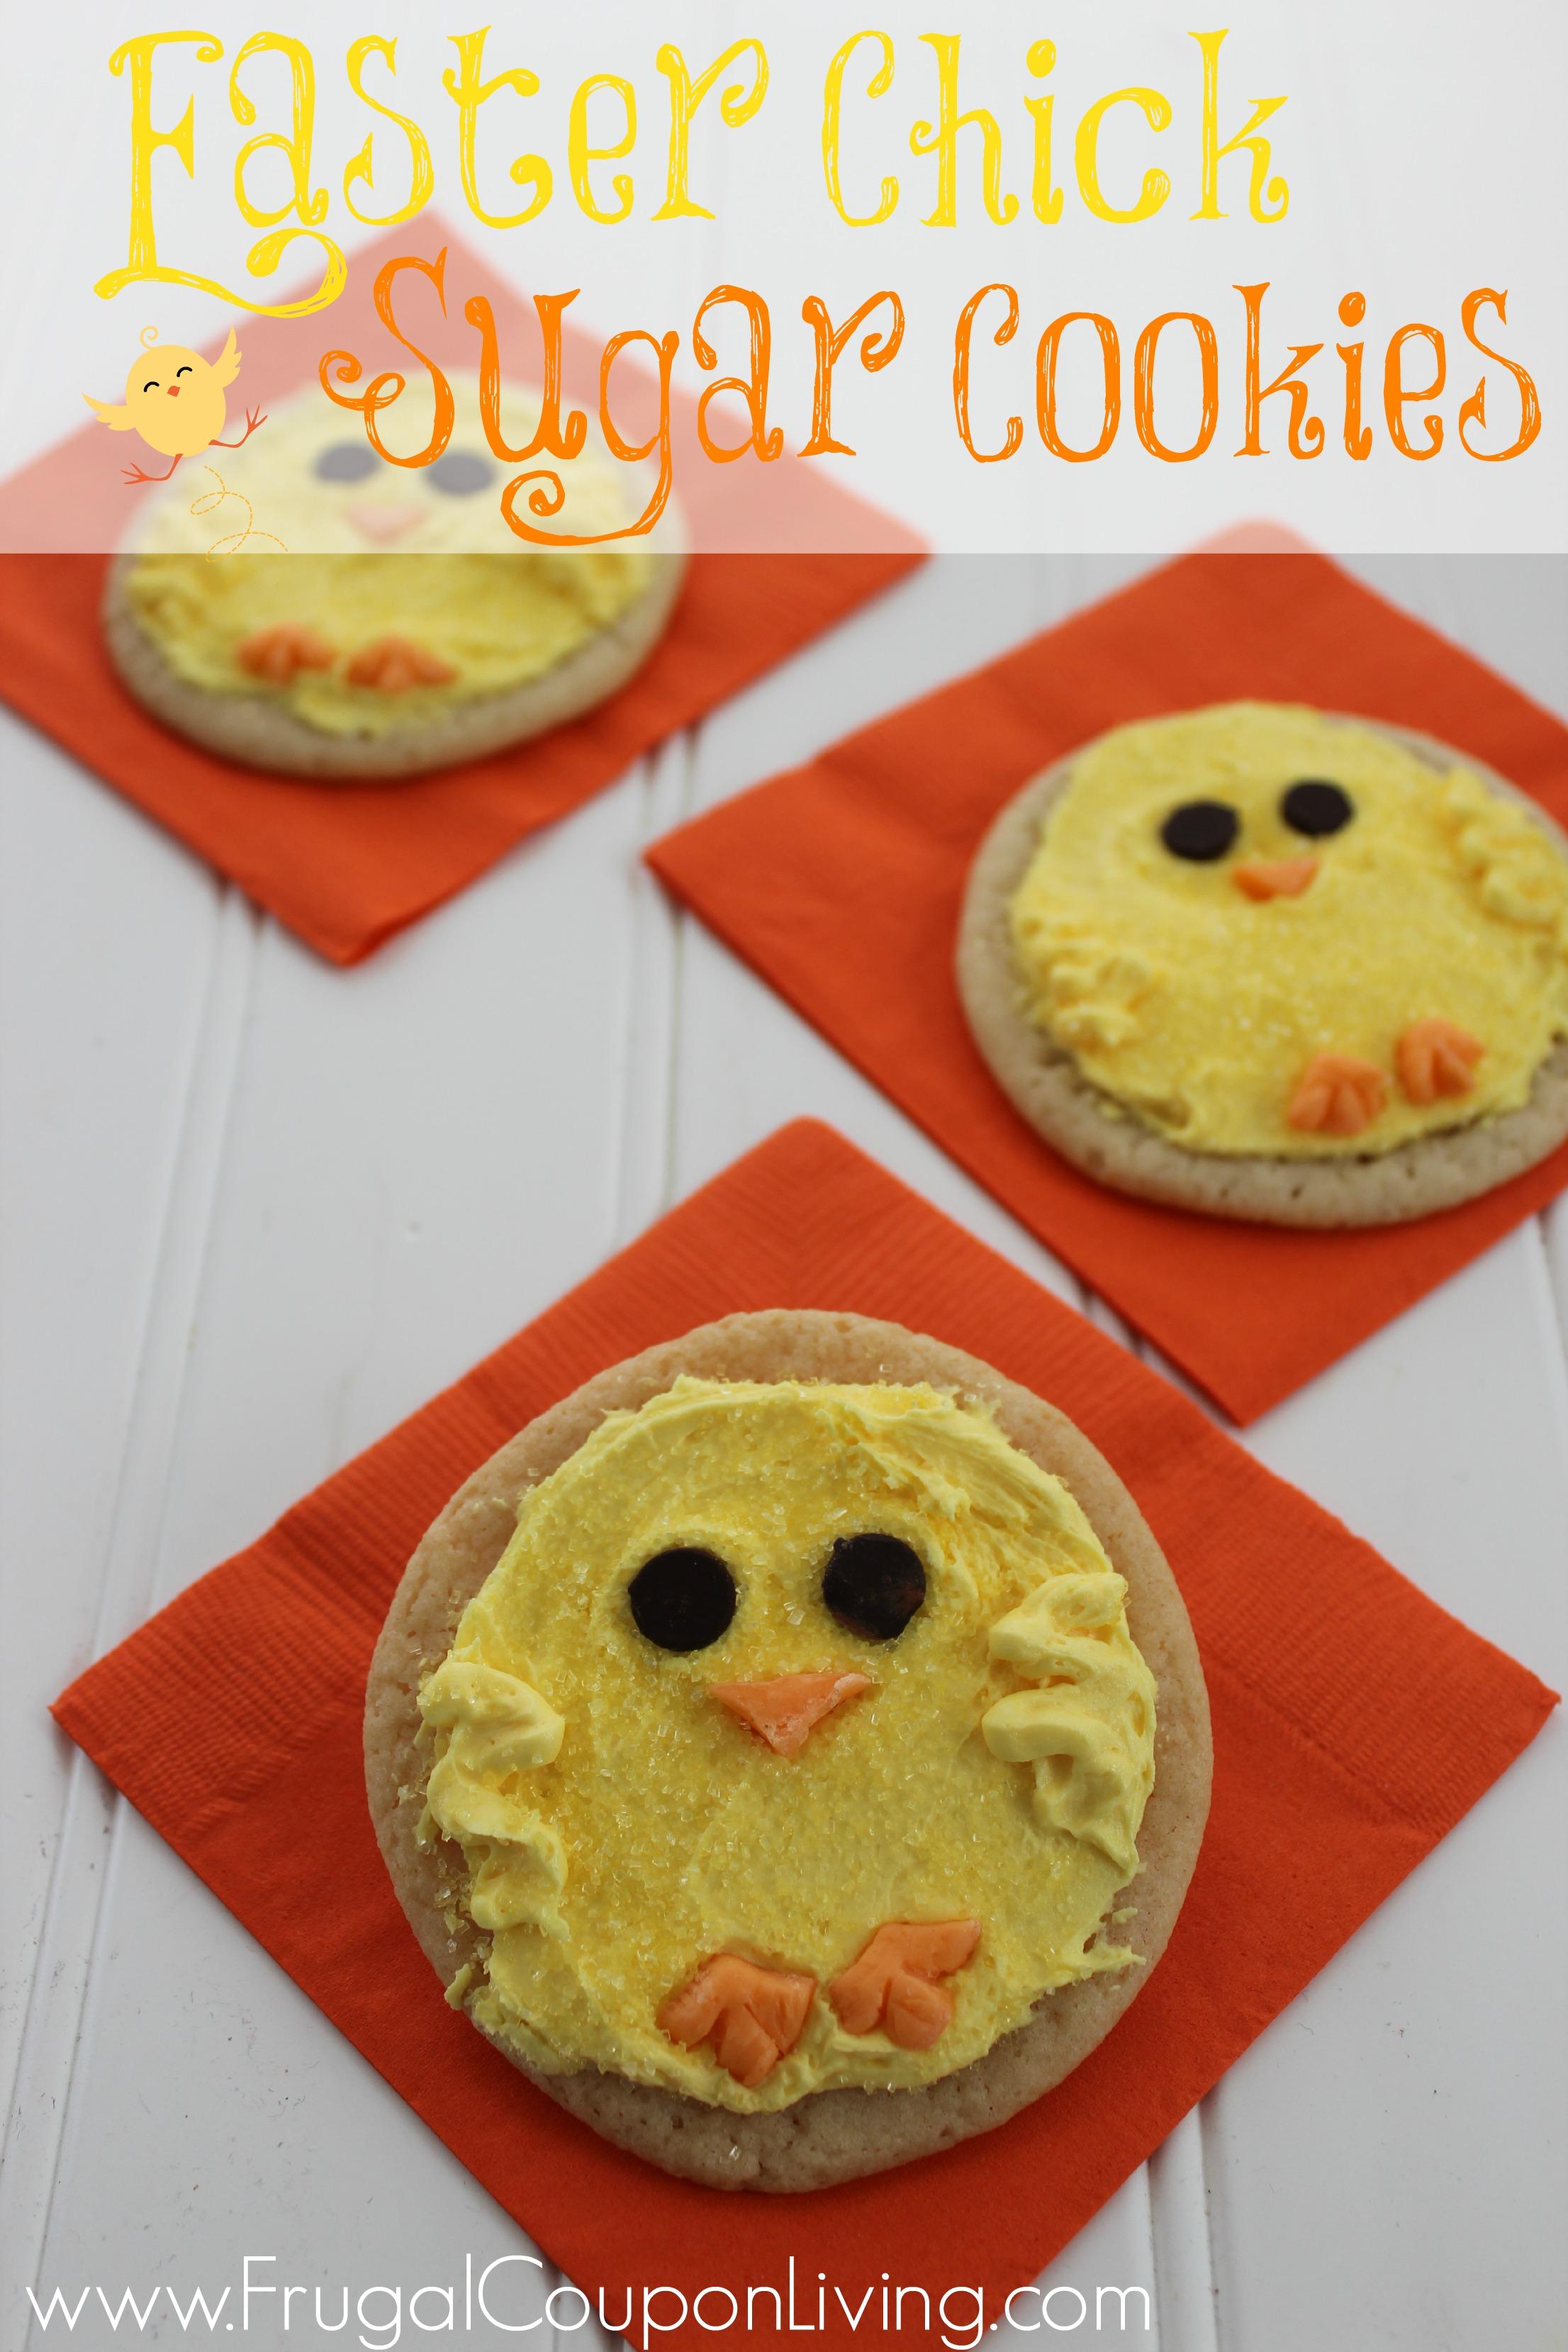 Albertsons sugar cookie recipe